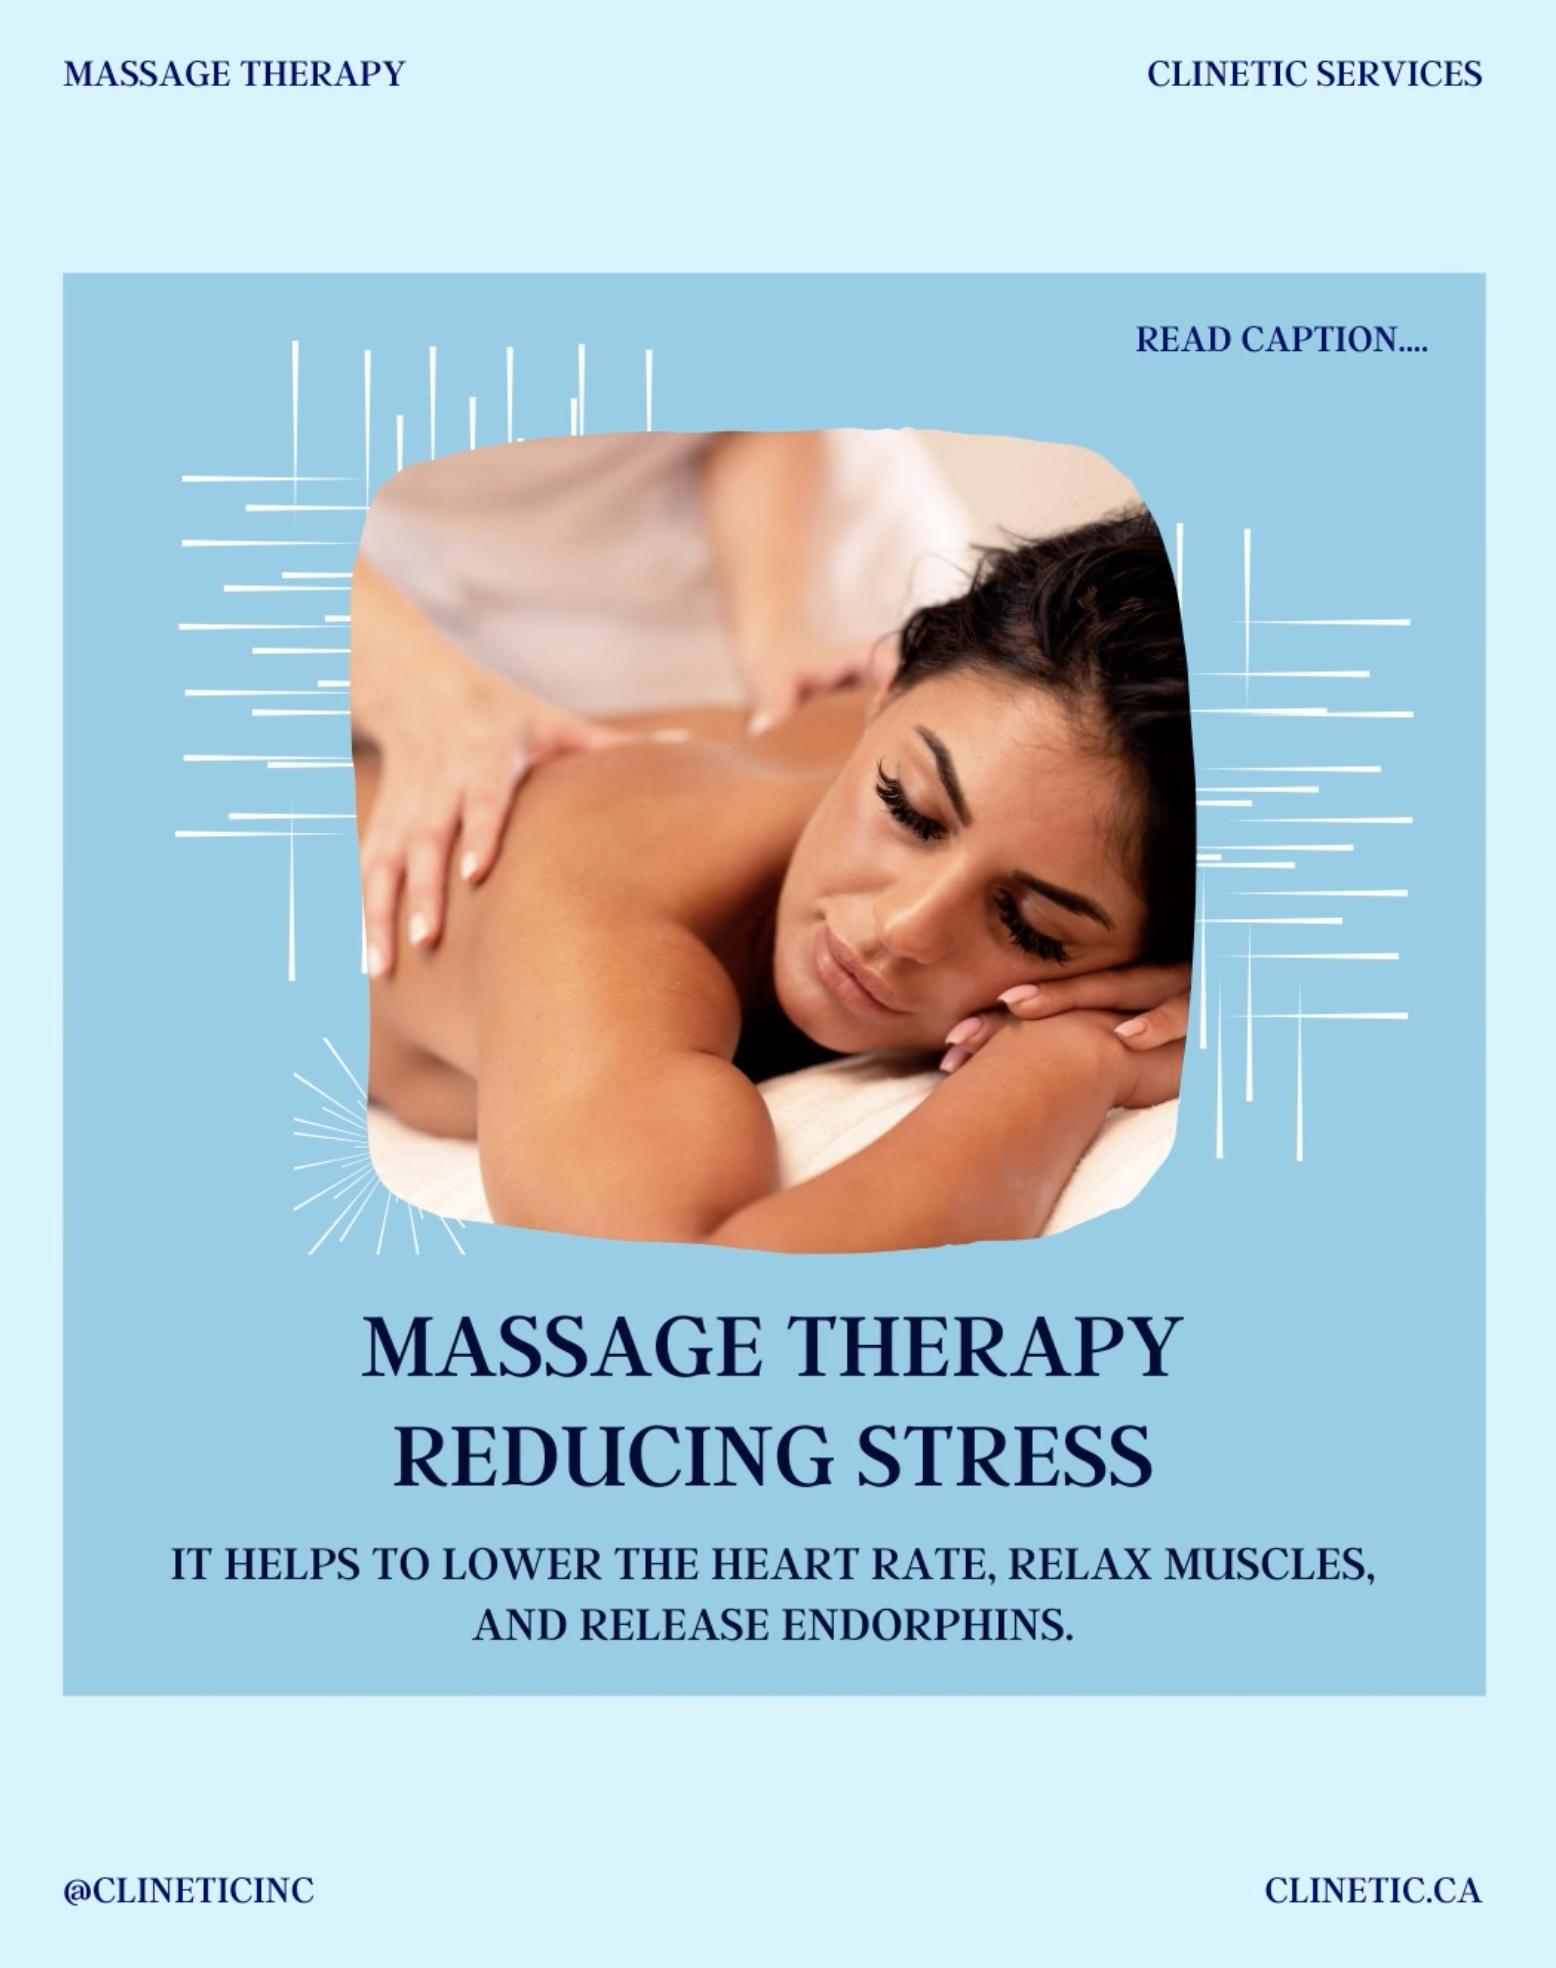 Massage Therapy Reducing Stress